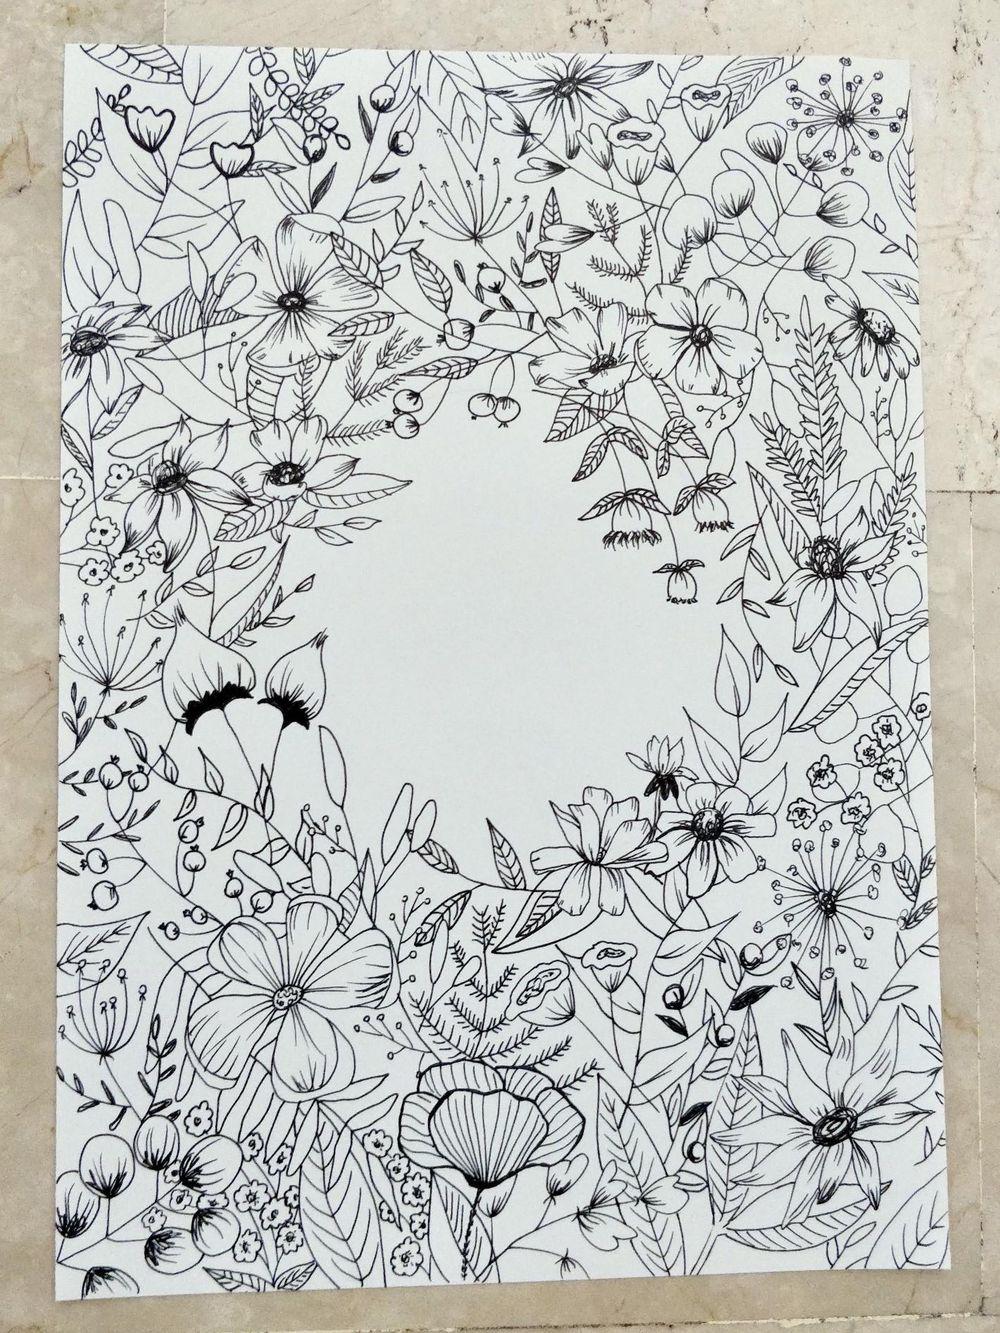 Floral Illustration: Composition Meets Negative Space - image 1 - student project